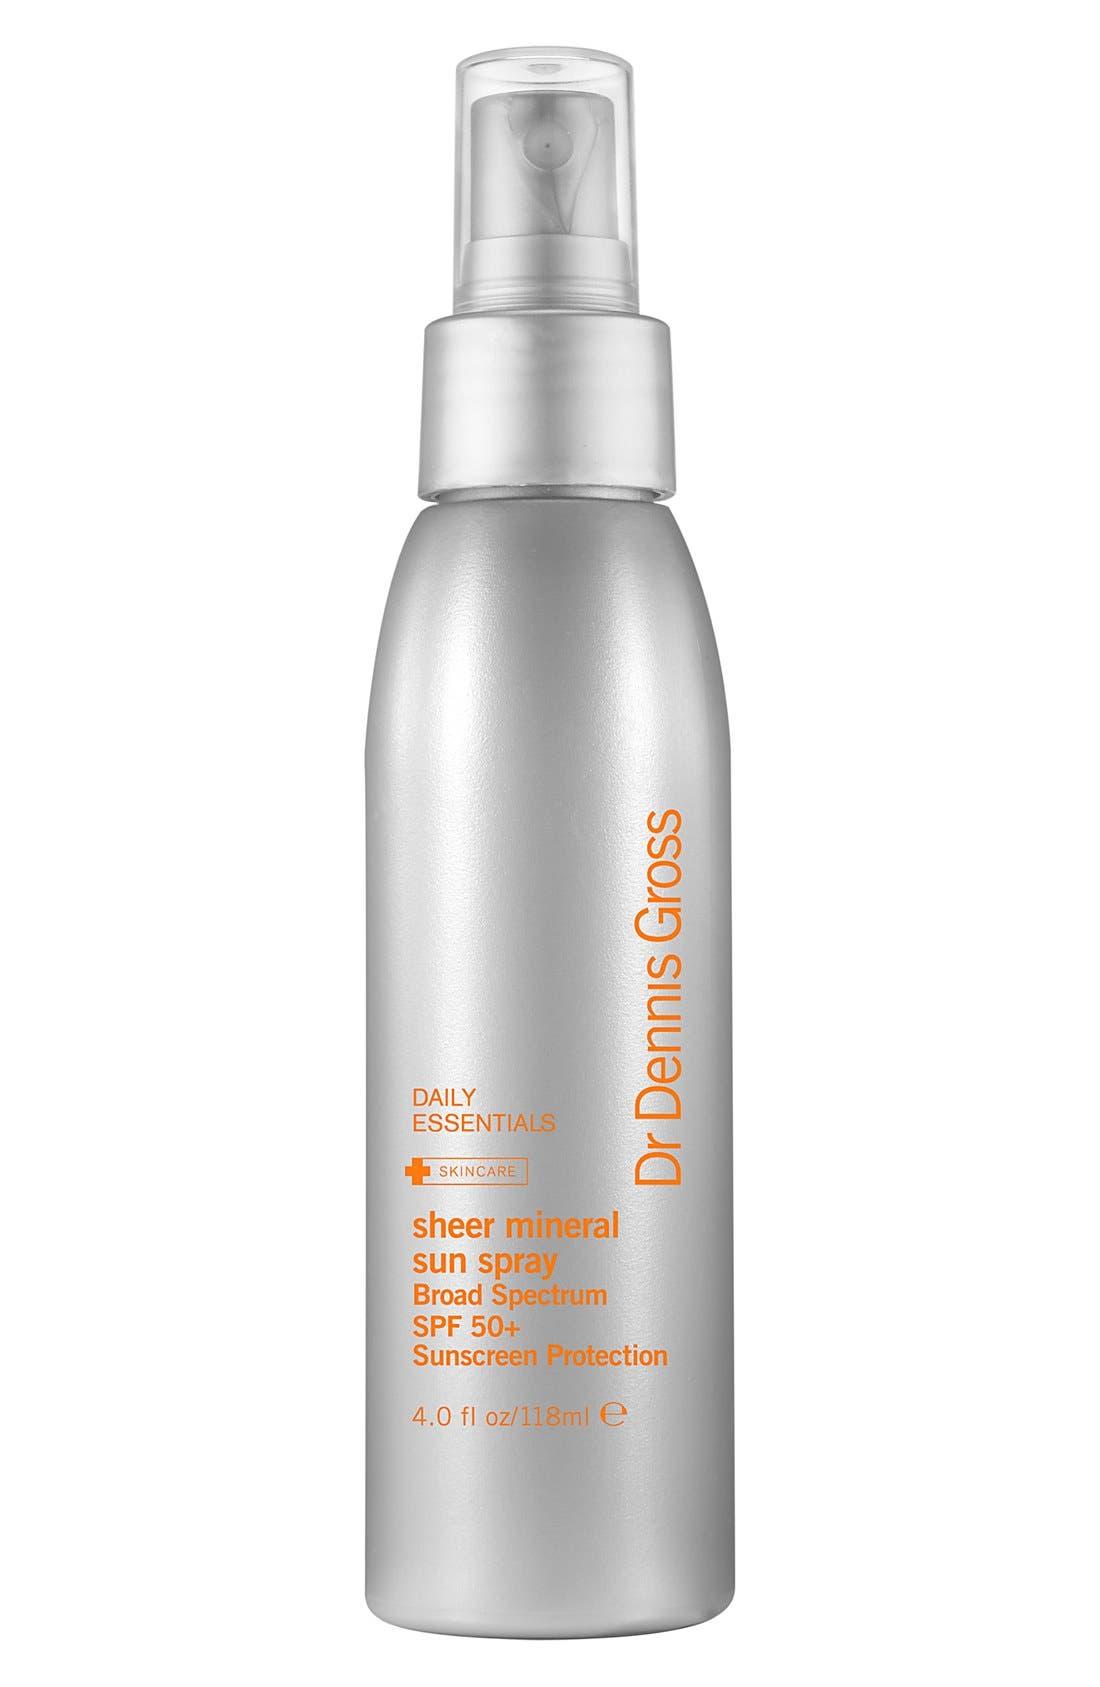 Sheer Mineral Sun Spray Broad Spectrum SPF 50+ Sunscreen Protection,                             Main thumbnail 1, color,                             000